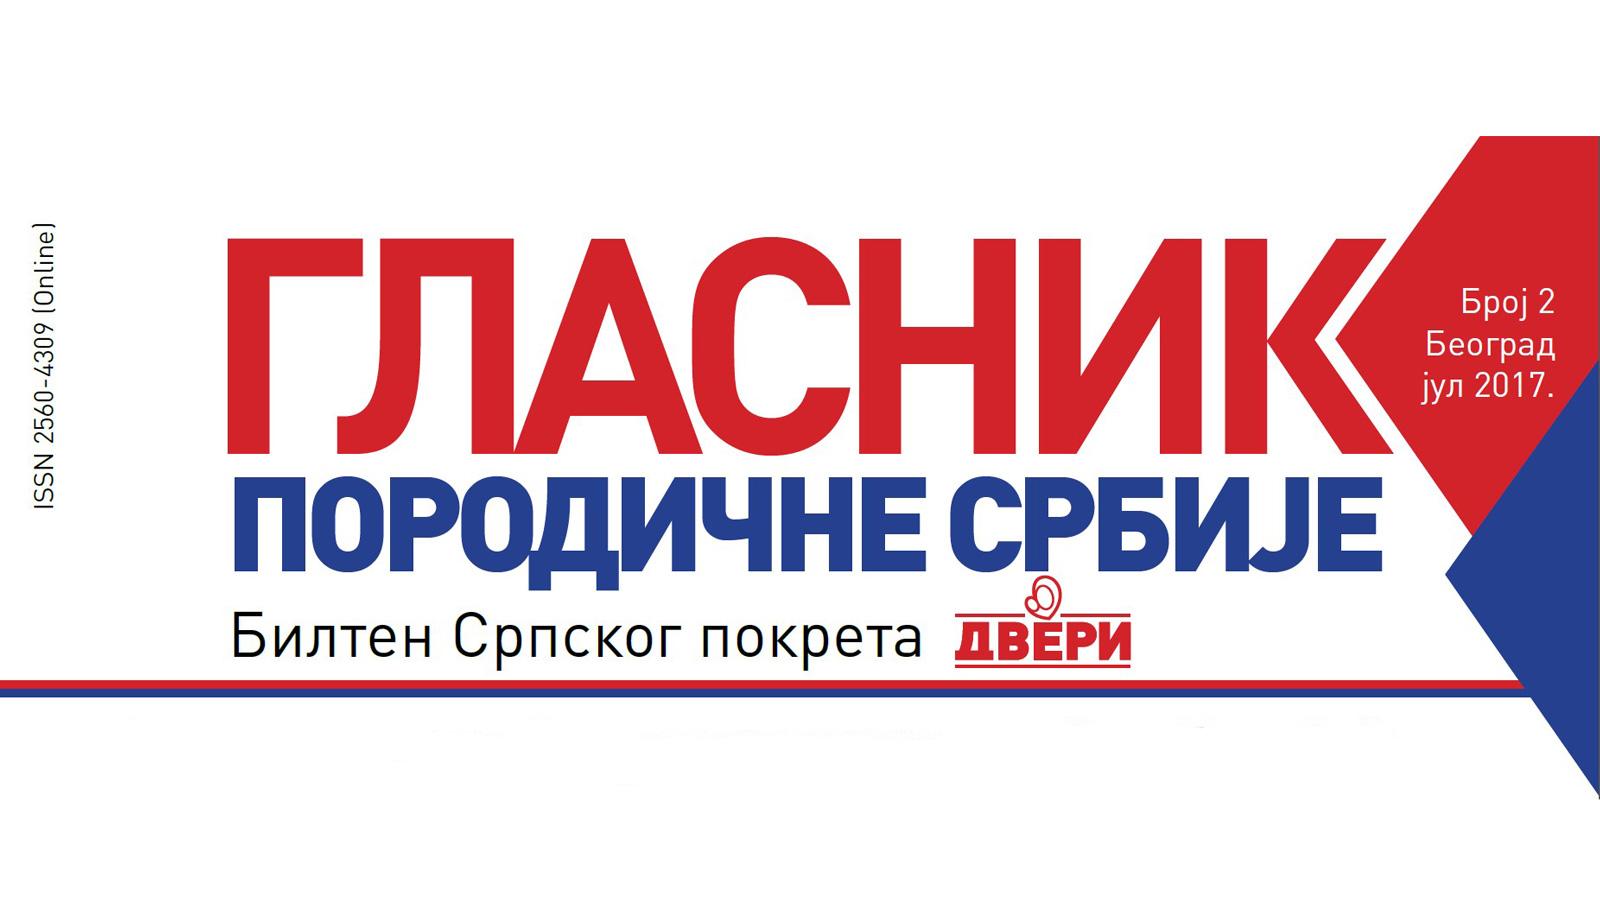 Glasnik porodične Srbije br. 2